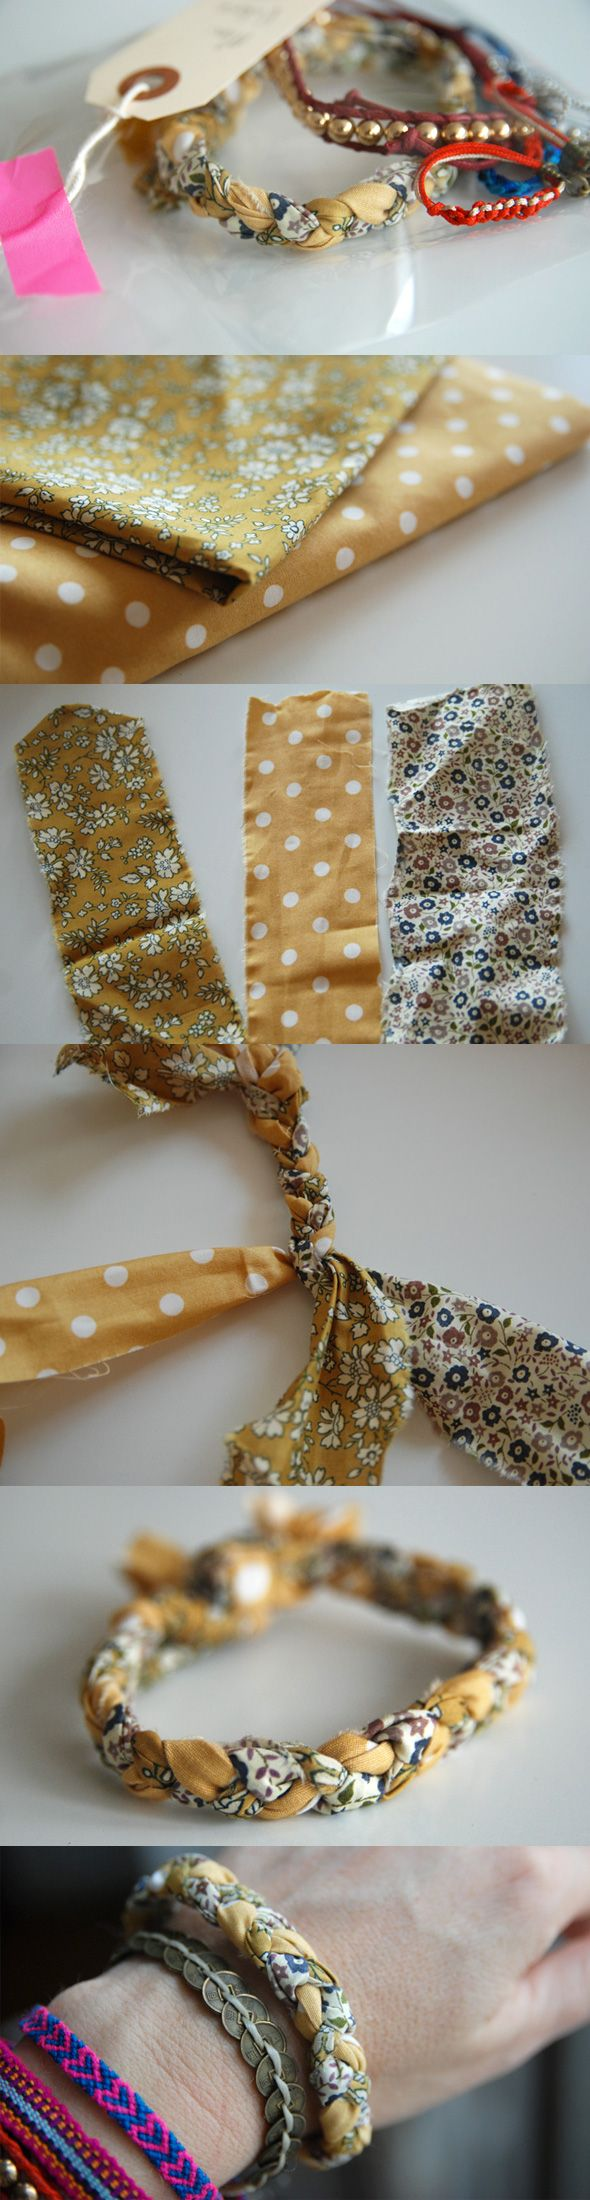 des restes de tissu en stock r alisez un joli bracelet en tissu diy a offrir ou s 39 offrir. Black Bedroom Furniture Sets. Home Design Ideas